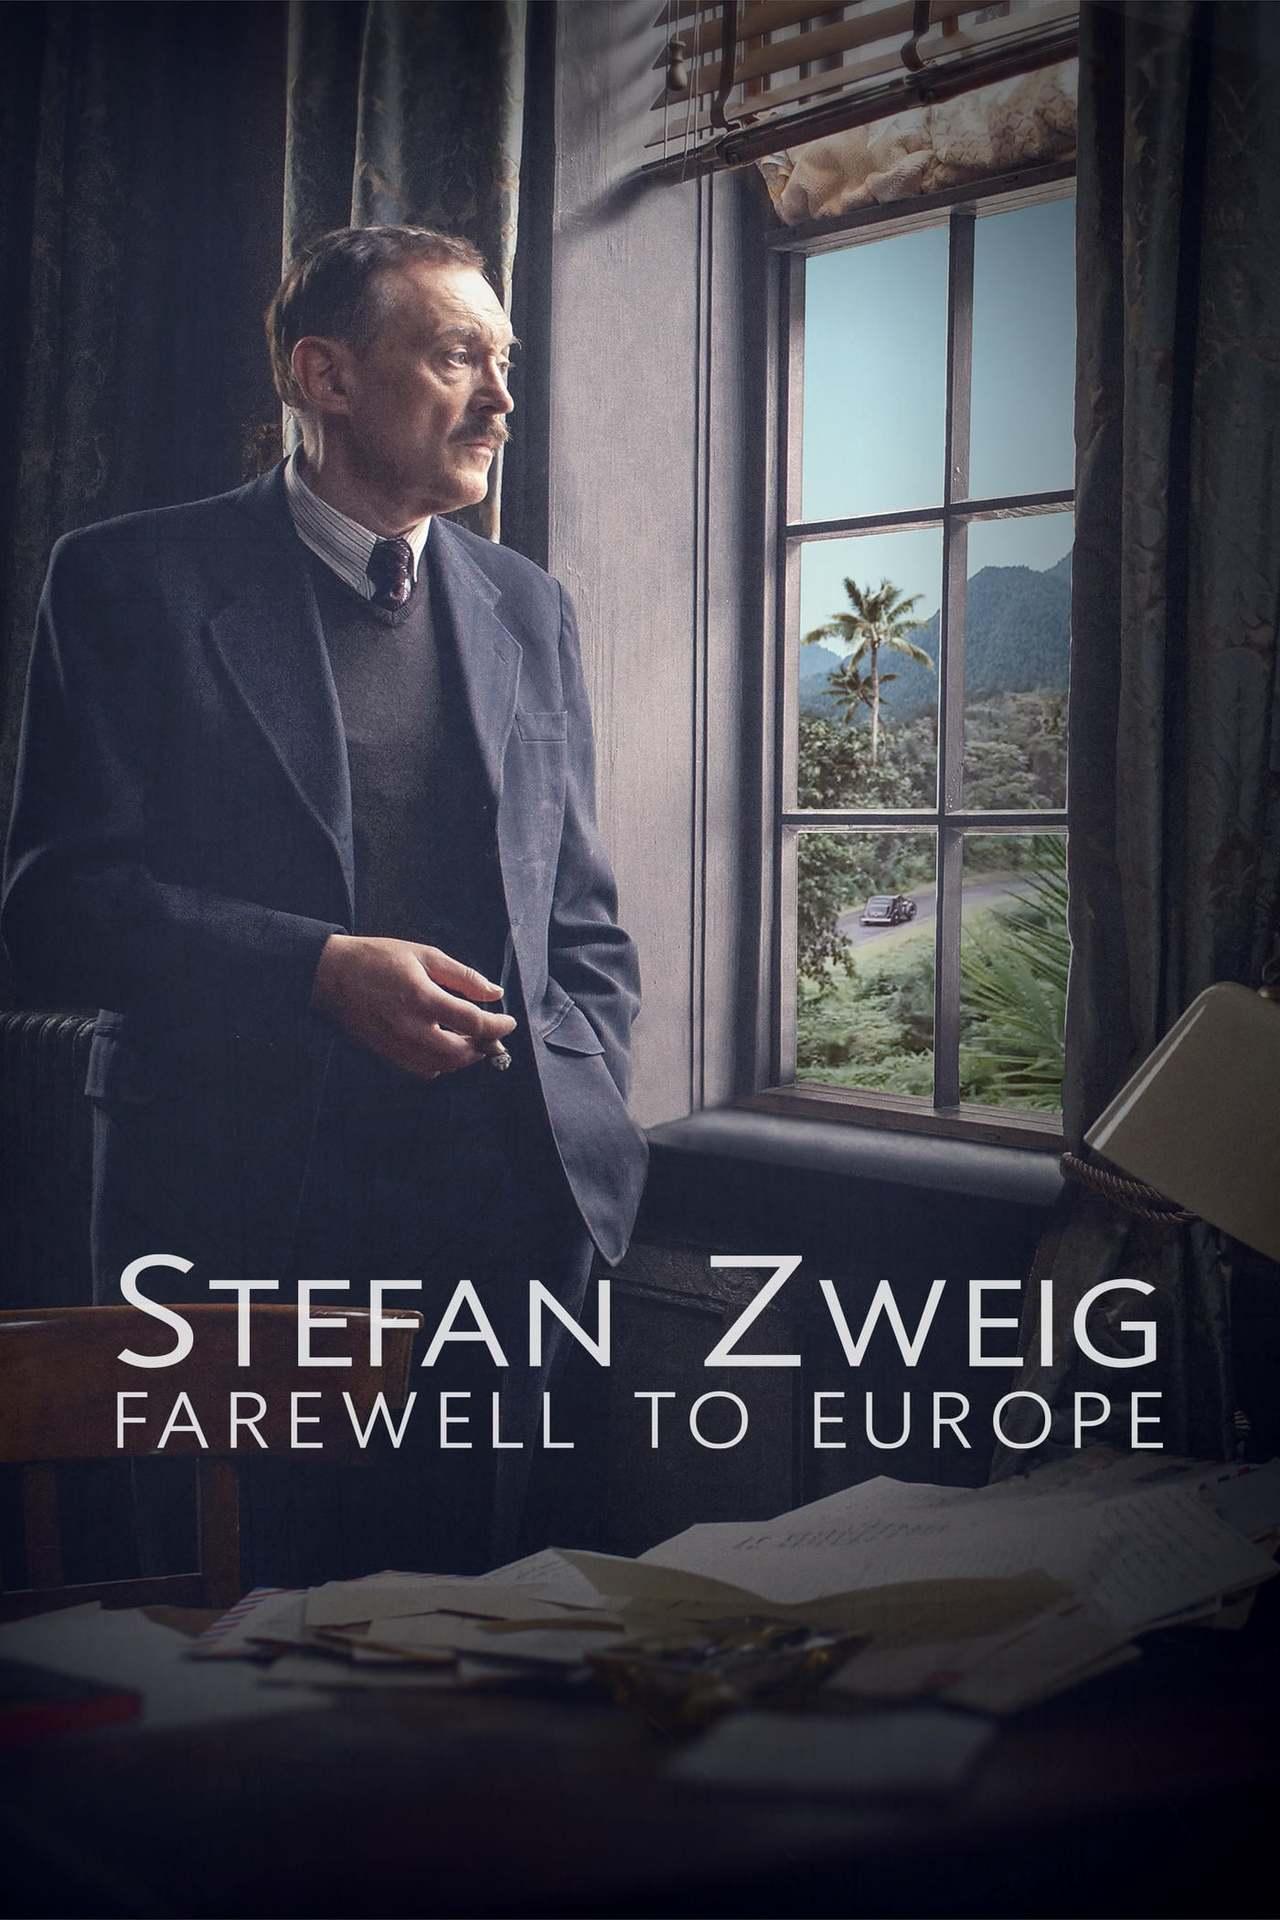 Постер фильма Стефан Цвейг Stefan Zweig: Farewell to Europe 2016